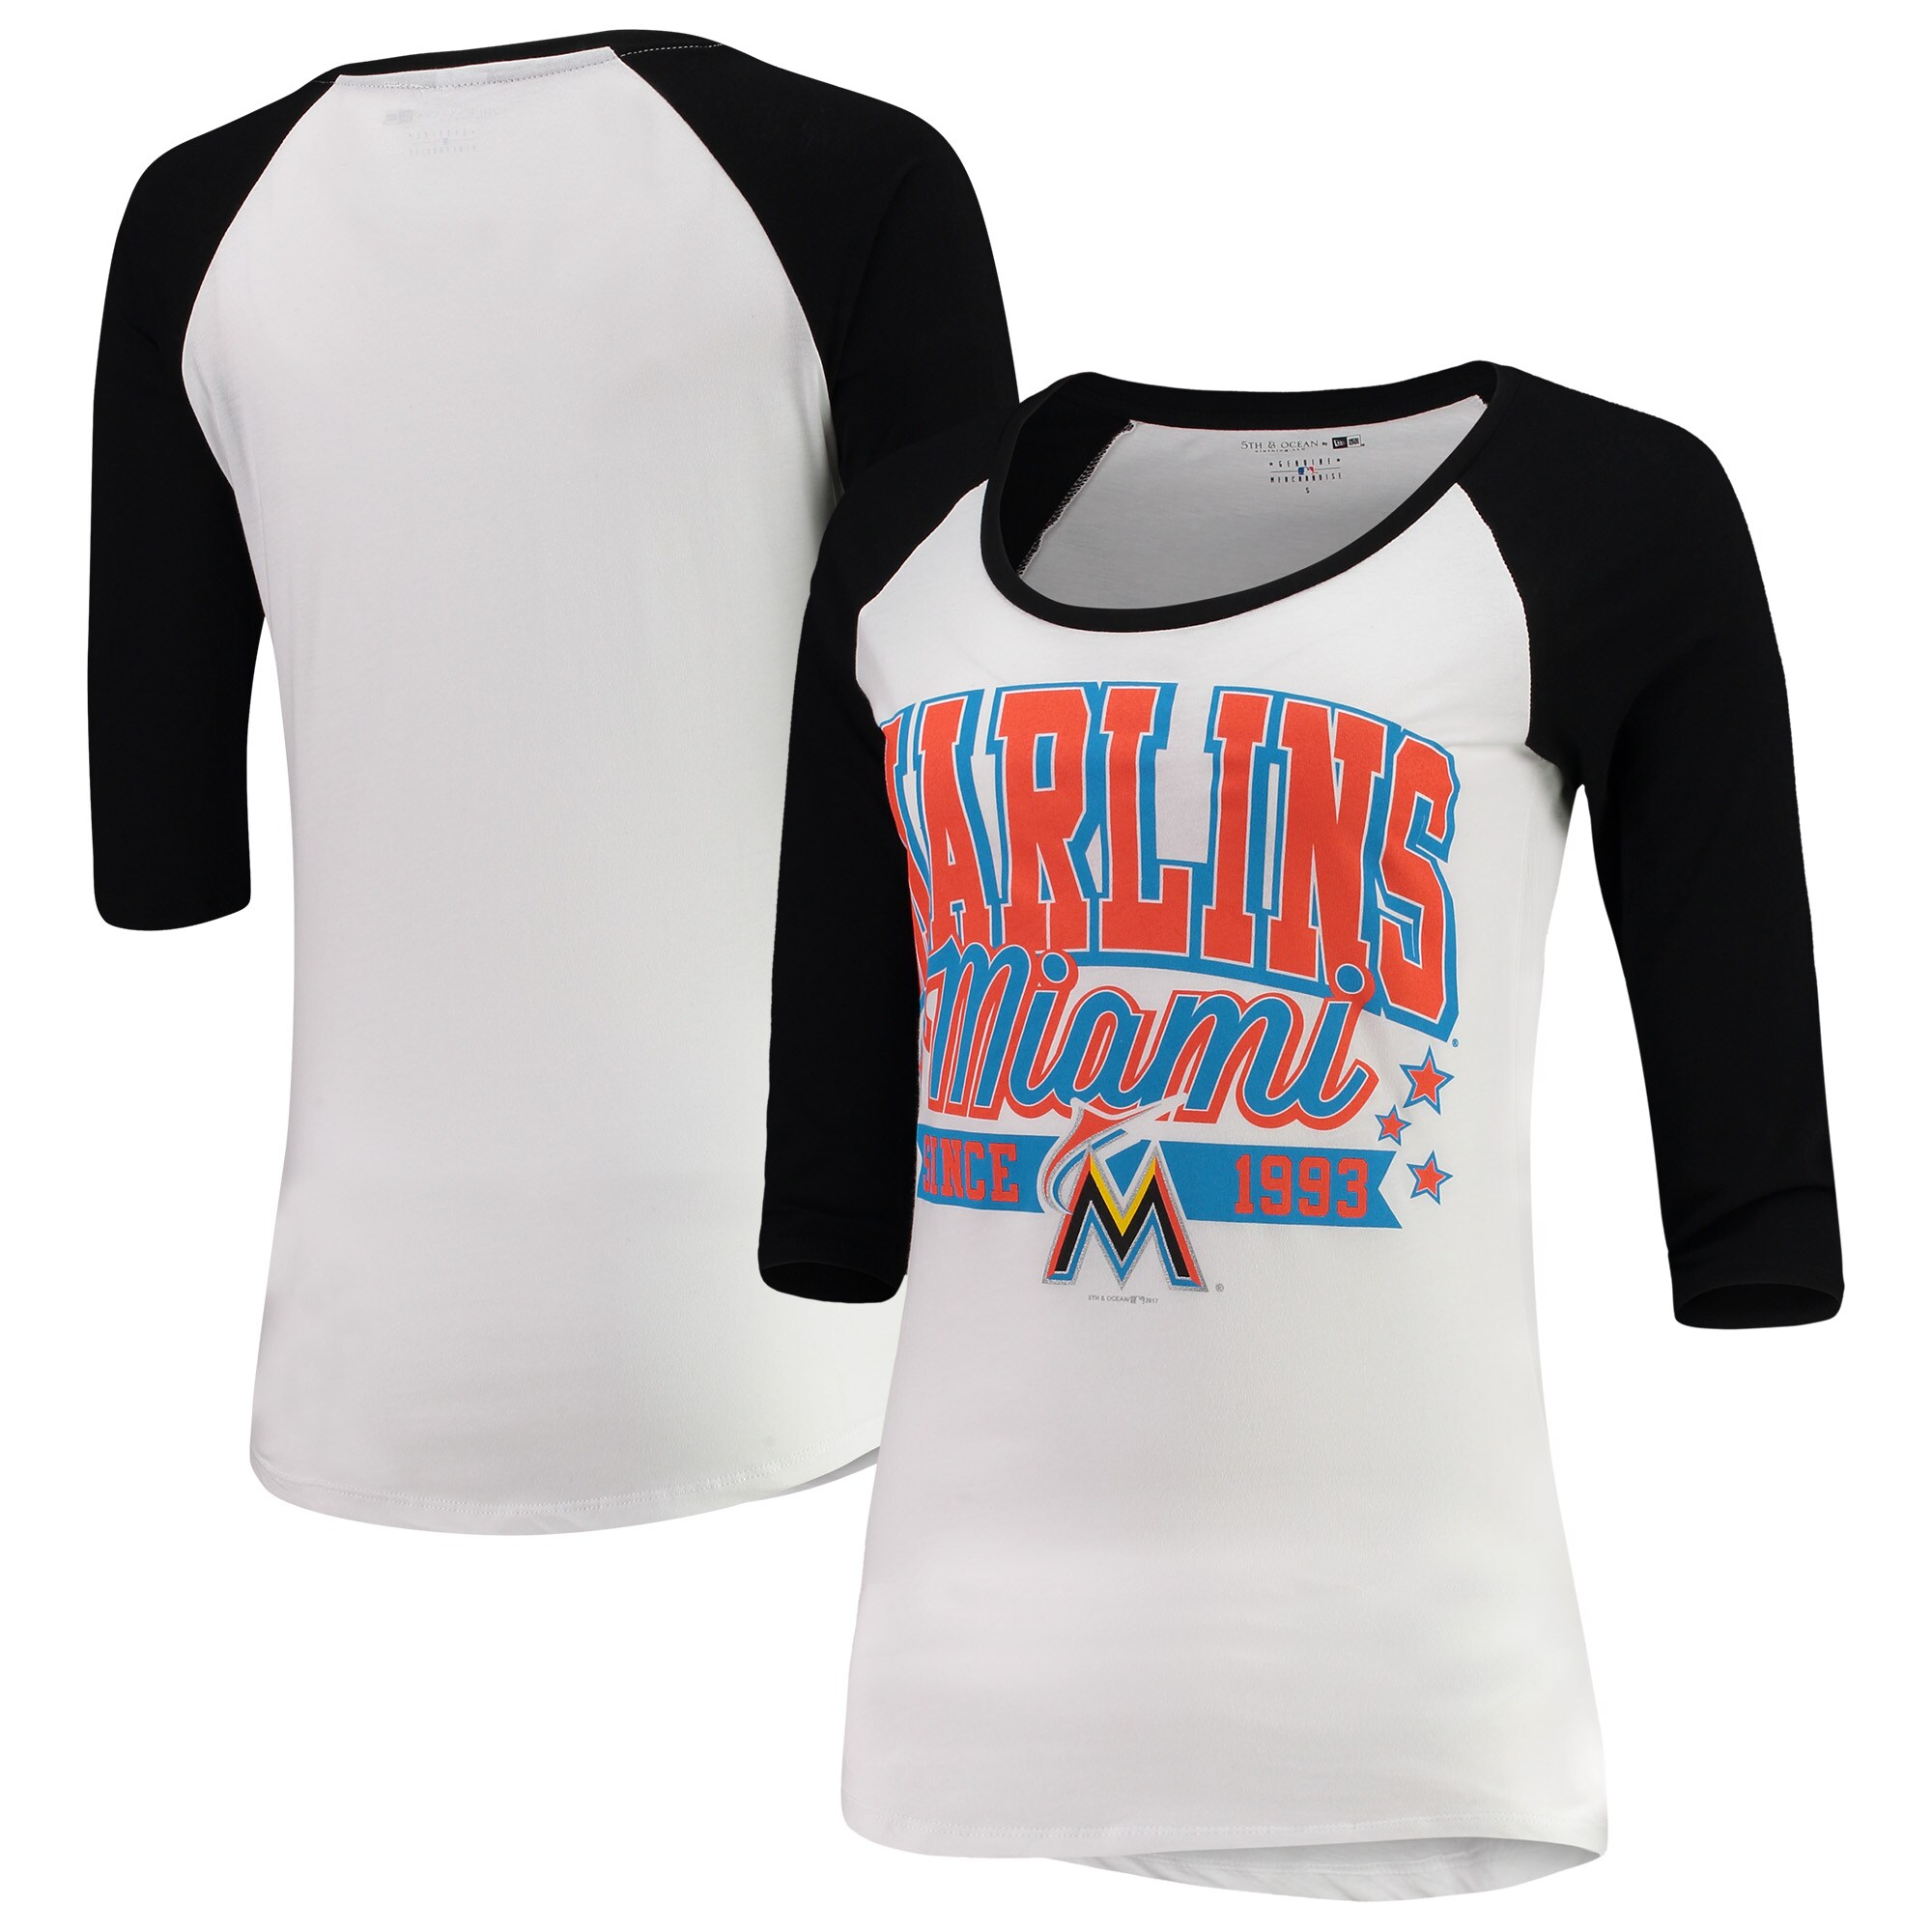 Miami Marlins 5th & Ocean by New Era Women's Team Banner 3/4-Sleeve Raglan T-Shirt - White/Black